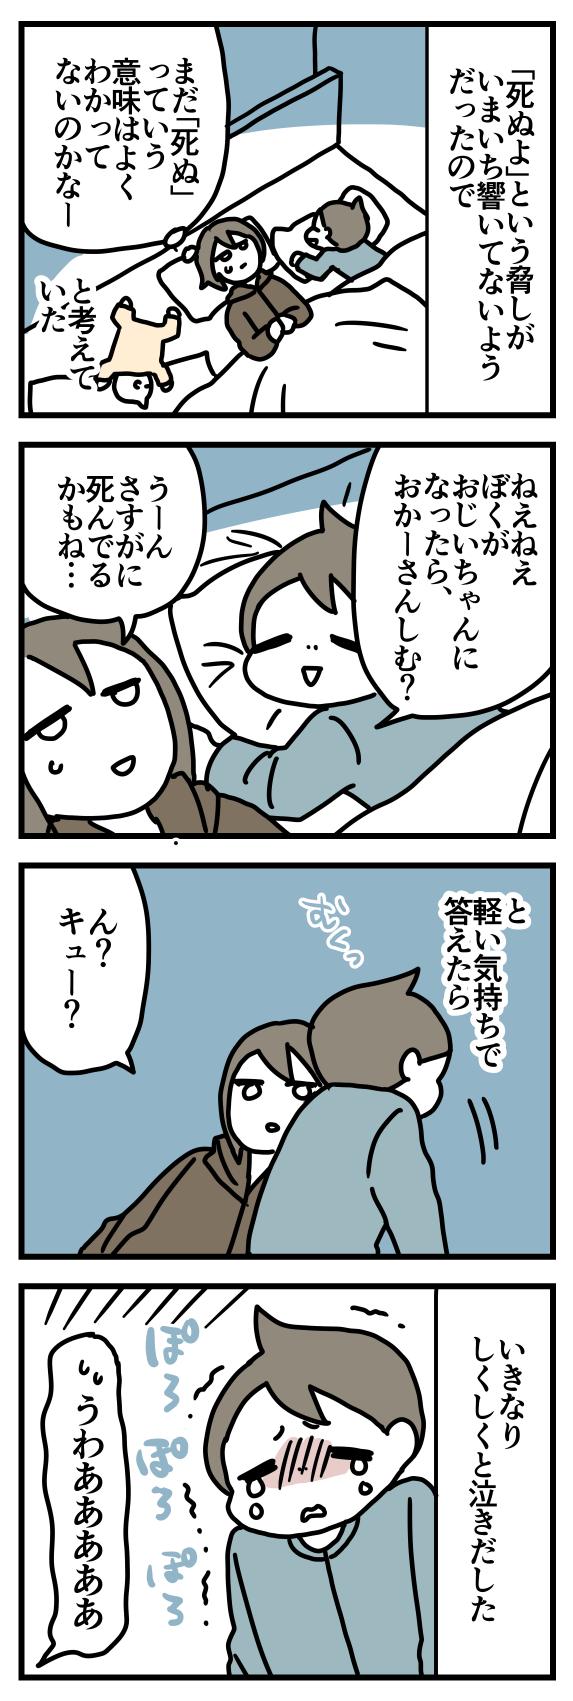 f:id:kanemotonomukuu:20171003150125j:plain